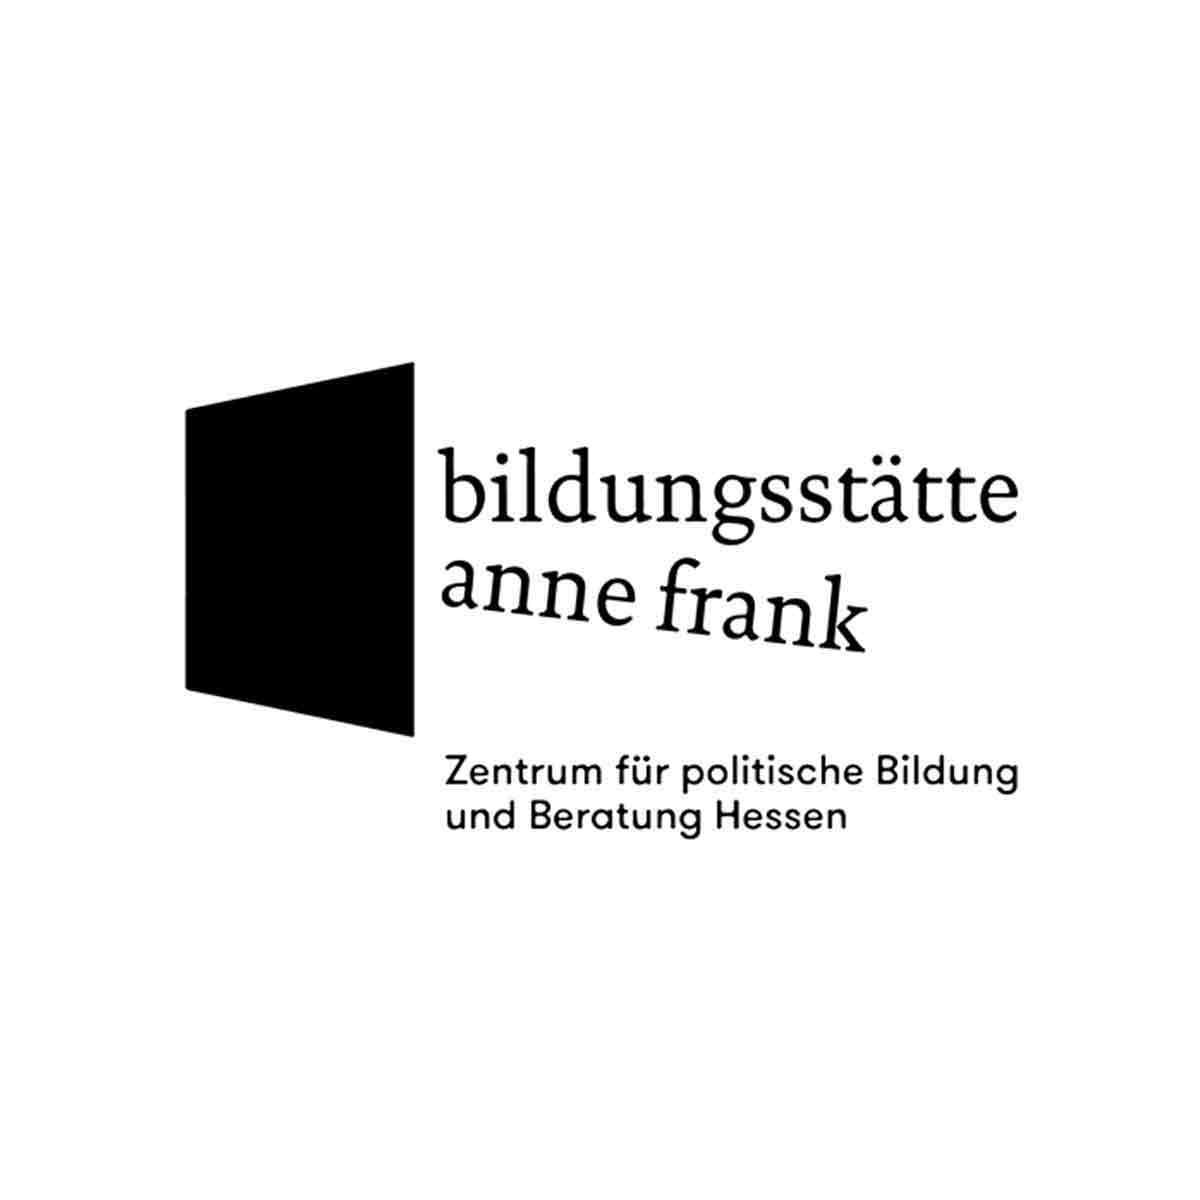 ROOM IN A BOX - Bildungsstätte Anne Frank